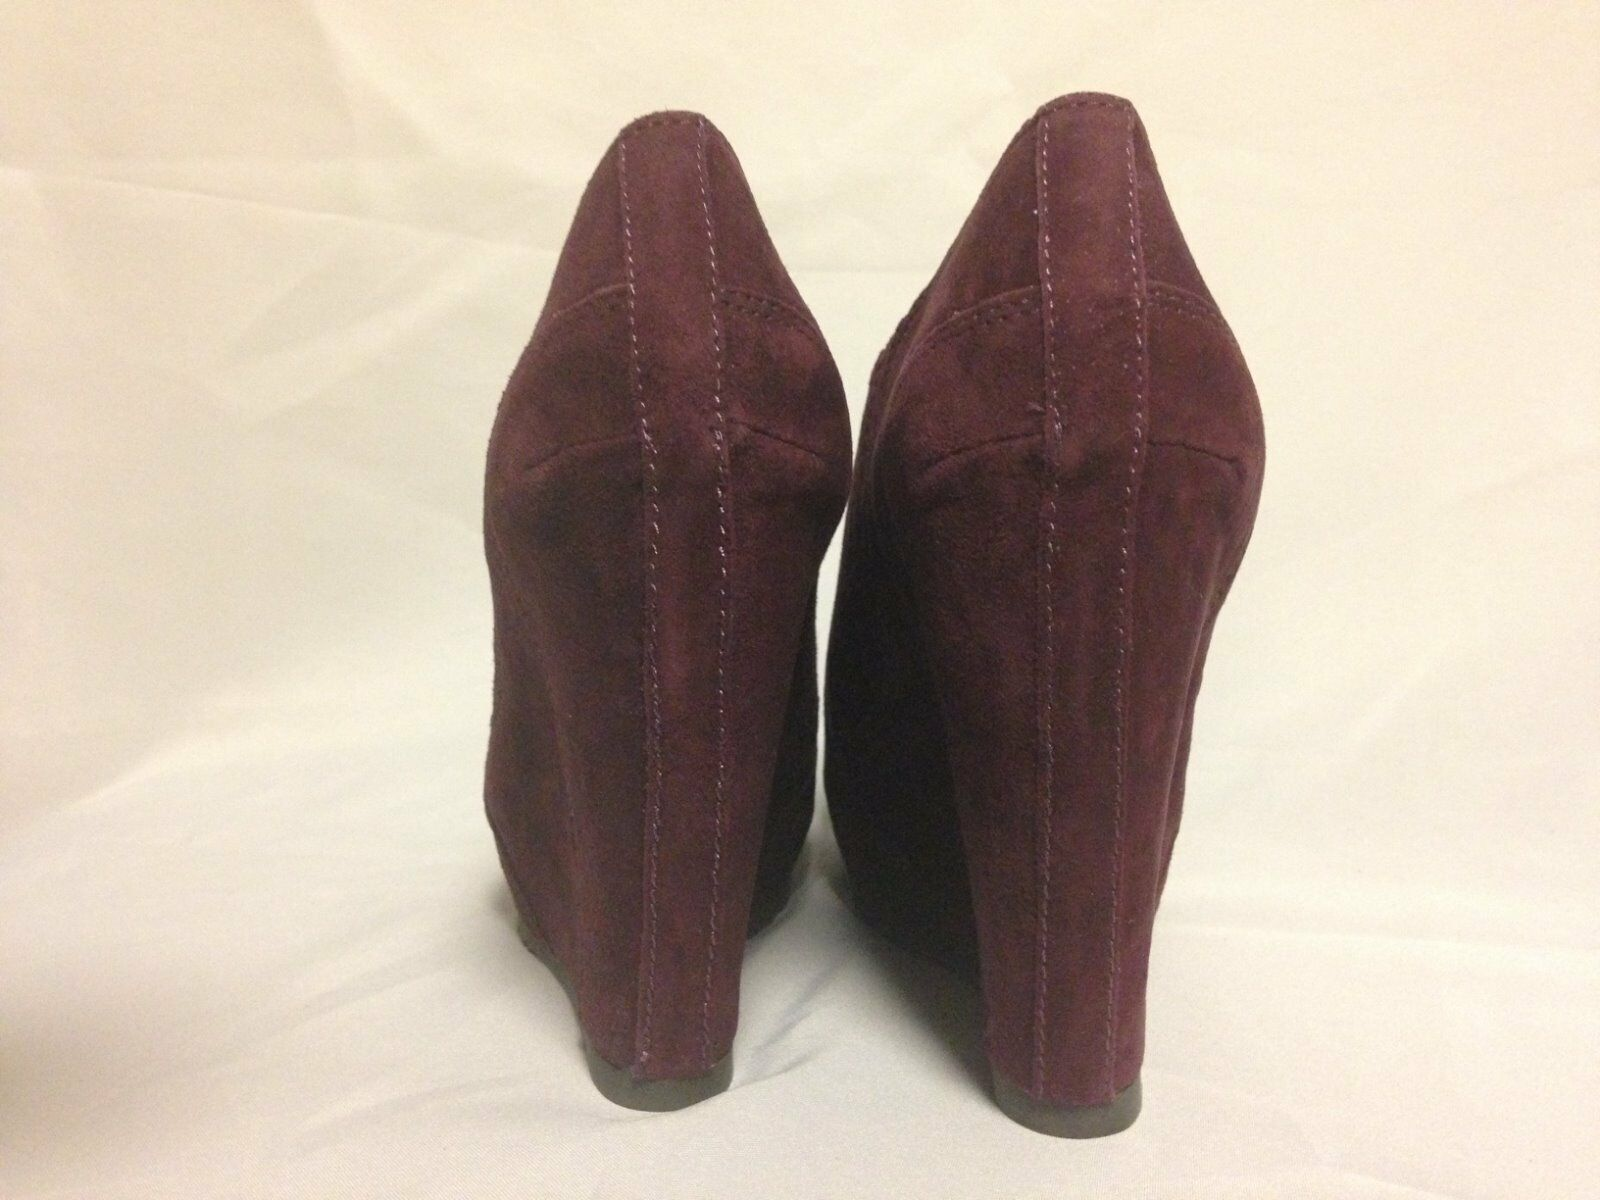 Luxury Rebel Kera Wedge Heel Ankle Boot 37 1/2 M Bordeaux Suede New w/ Box